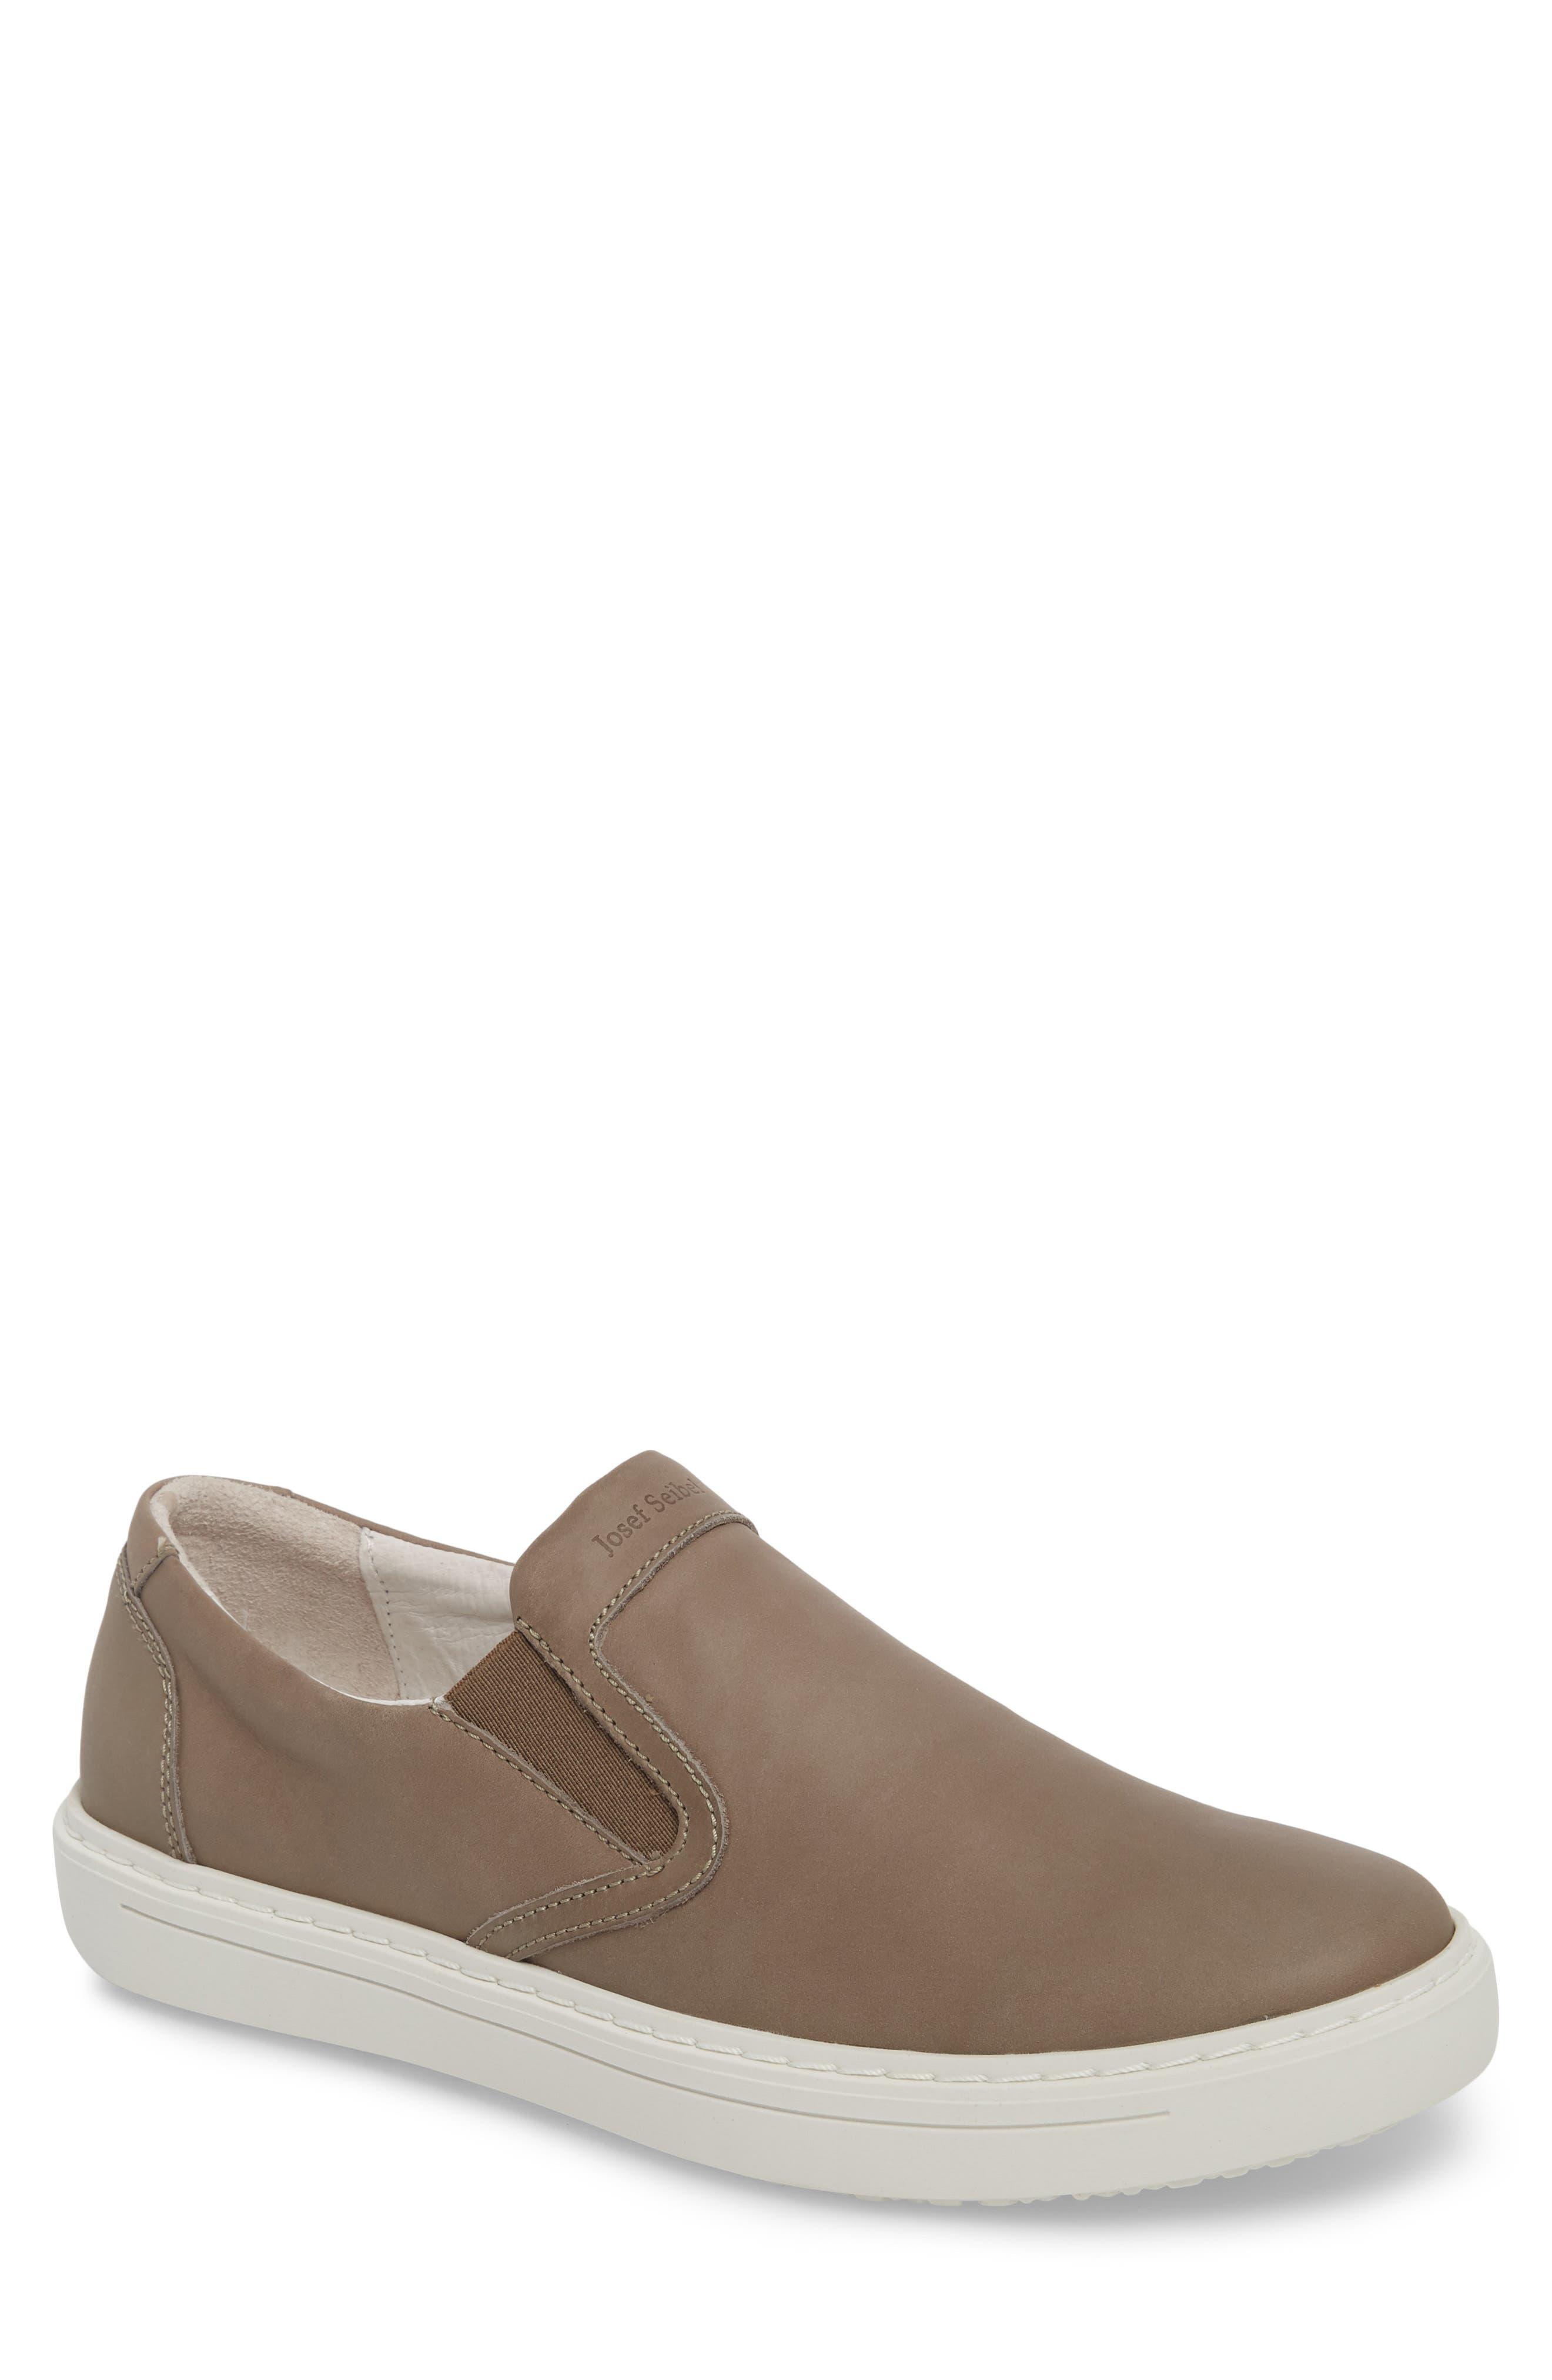 Josef Seibel Quentin 15 Slip-On Sneaker (Men)